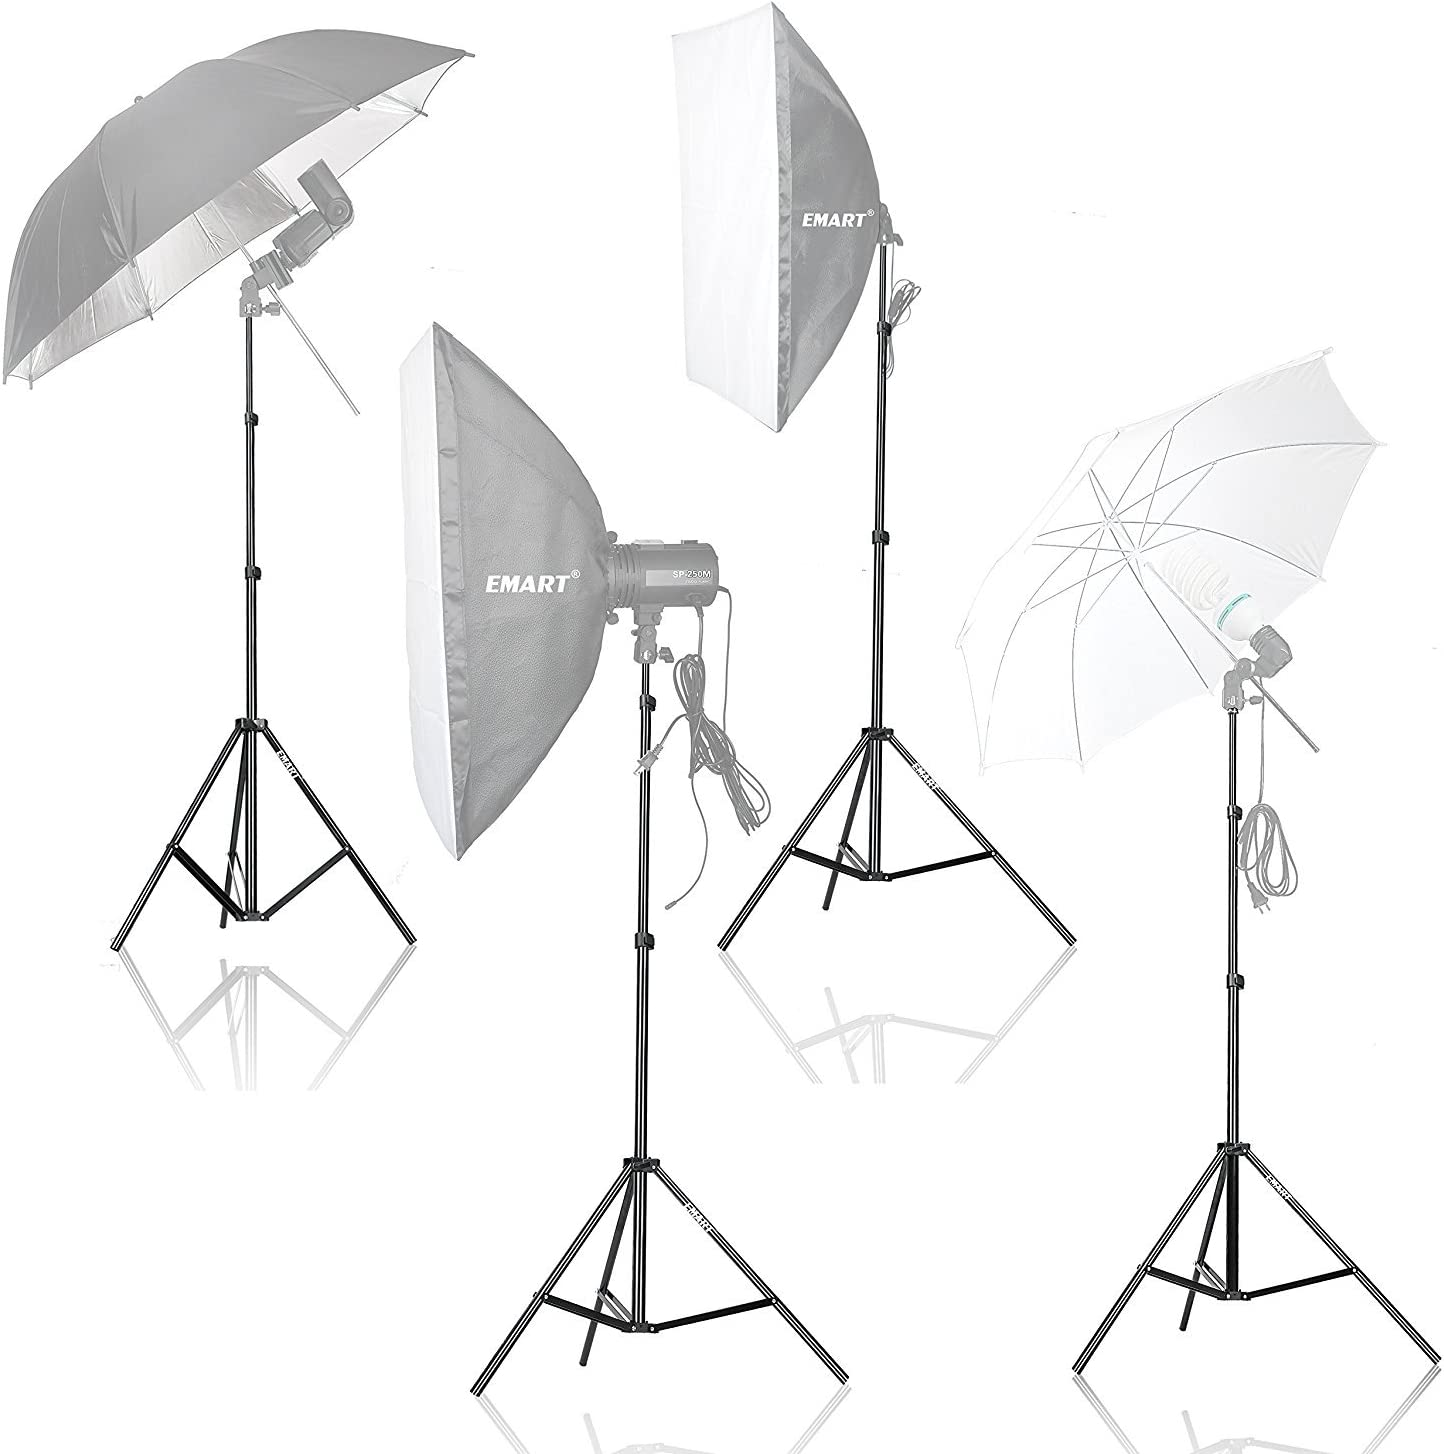 Emart 83 inch//7feet//210cm Photography Photo Studio Light Stand for Video Lighting Softbox Umbrella Flash Ring Light Camera